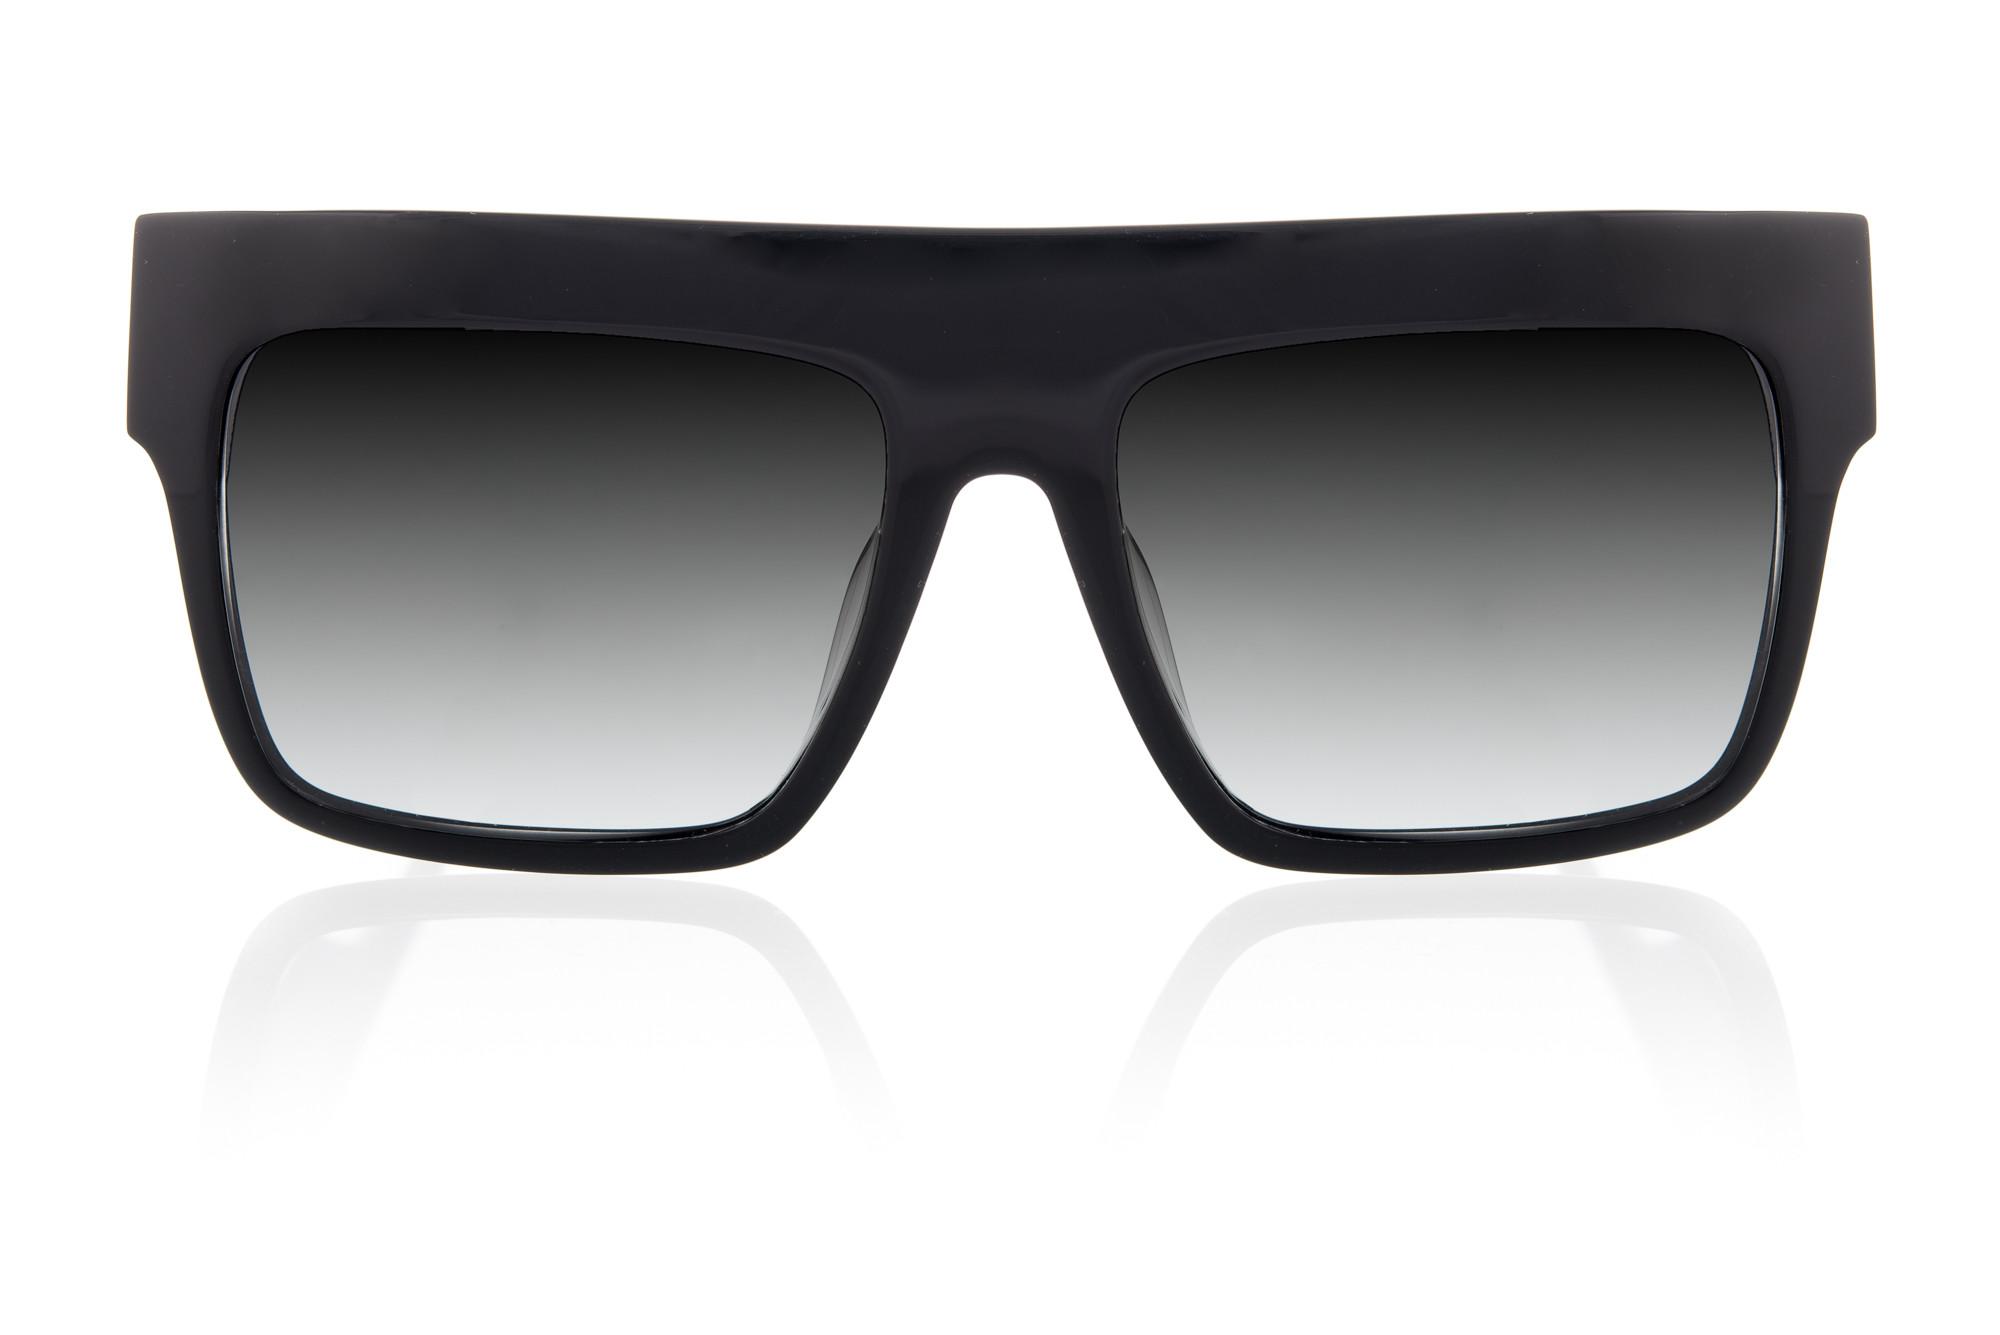 0d5f0b5b1b5c Quick tips regarding editing sunglasses and other eyewear